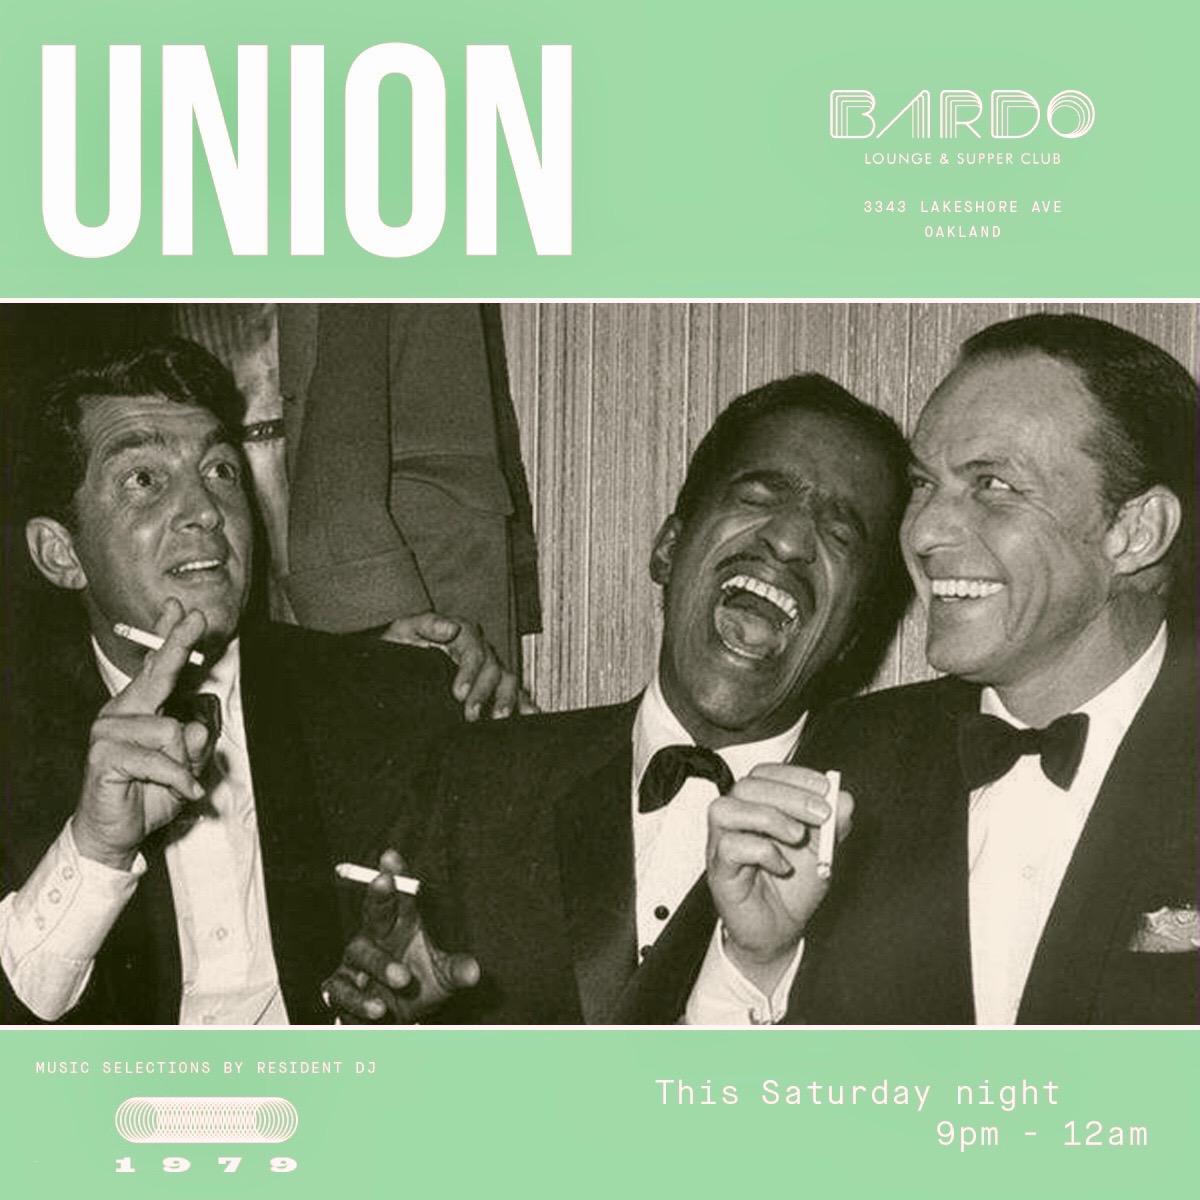 Union Jun15.jpg